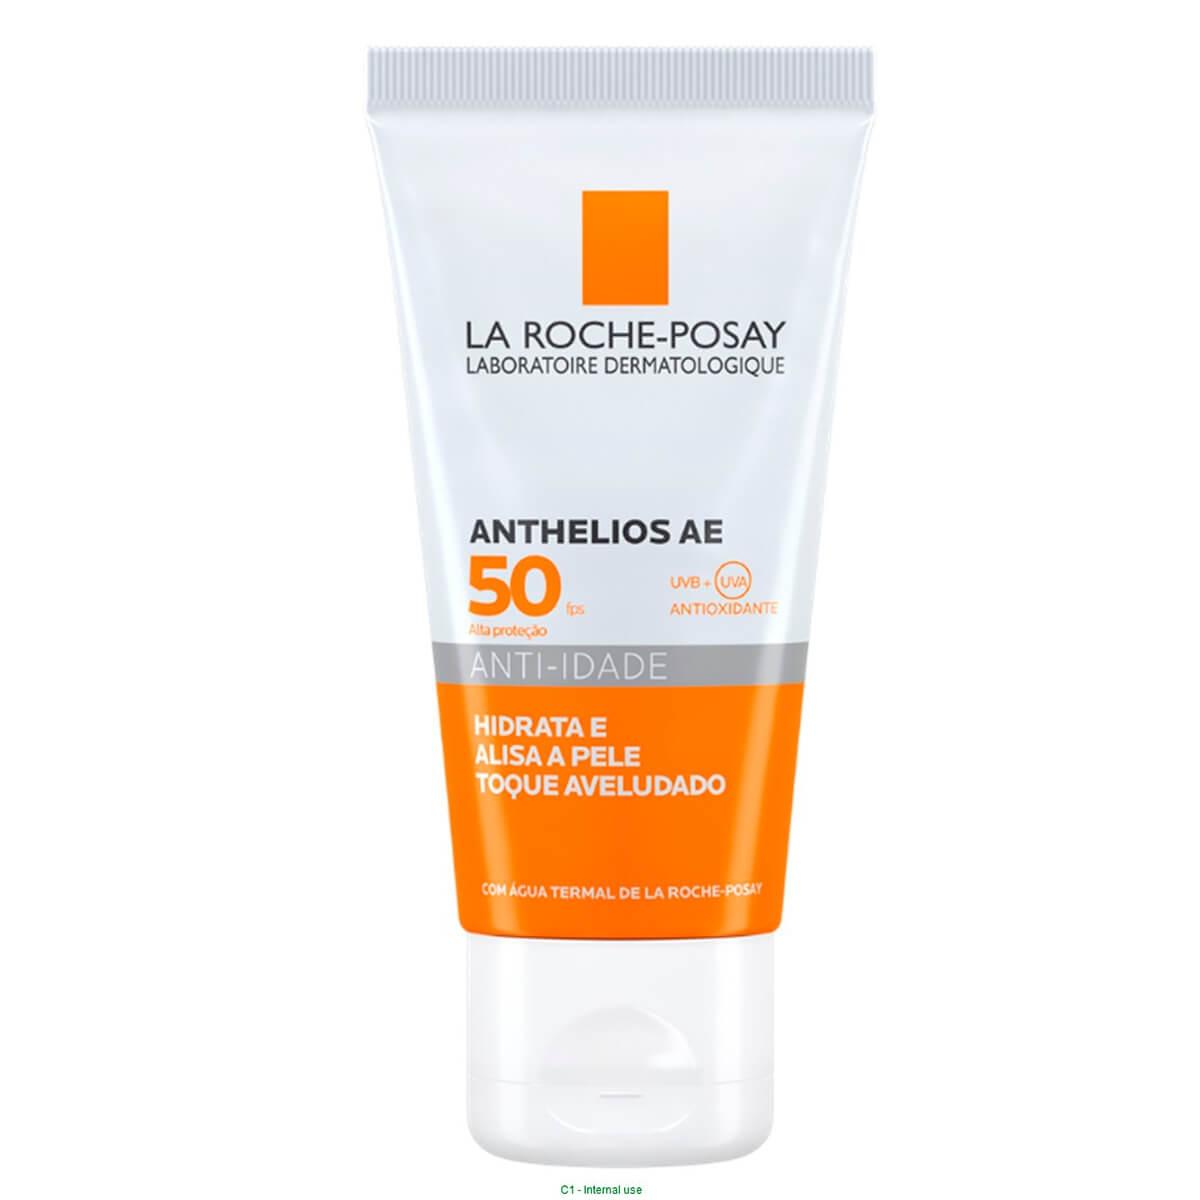 Protetor Solar Facial La Roche-Posay Anthelios AE Anti-Idade FPS 50 com 50g 50g